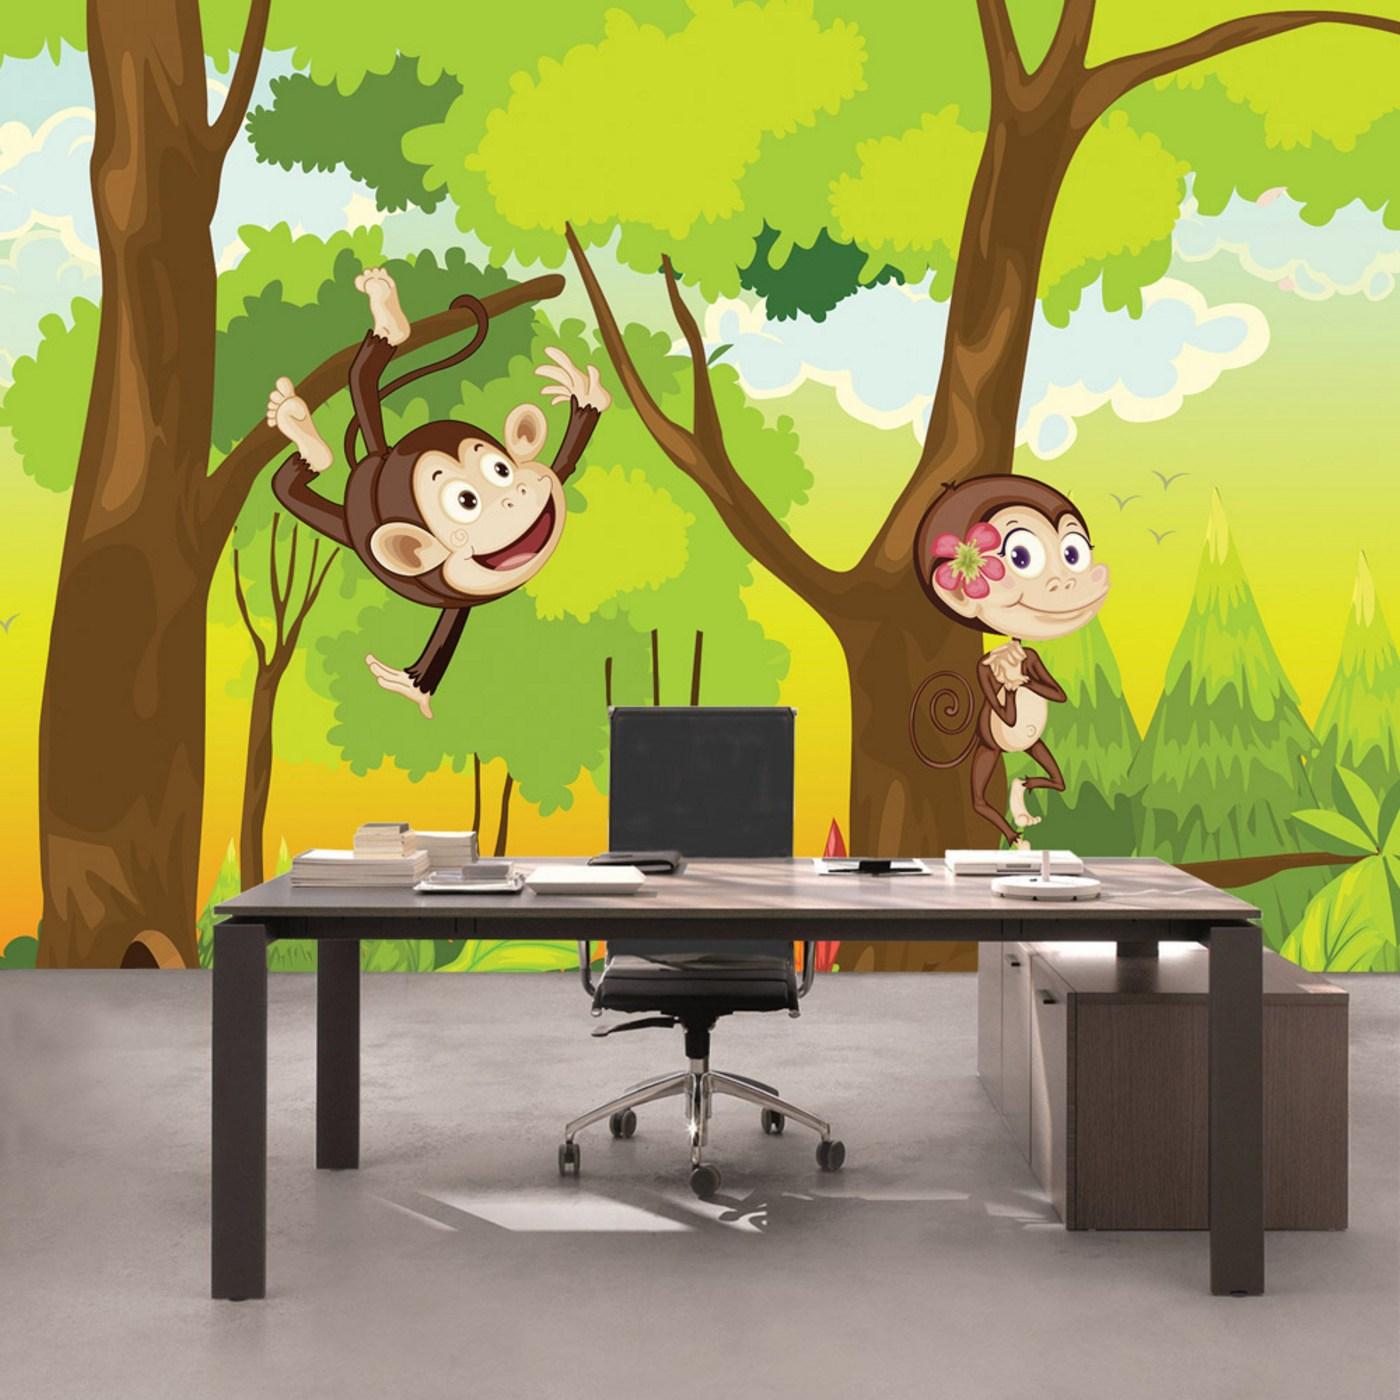 Vlies Fototapete 1756 - Illustrationen Tapete Kinder Affen Wald Bäume  Kindertapete Cartoon grün